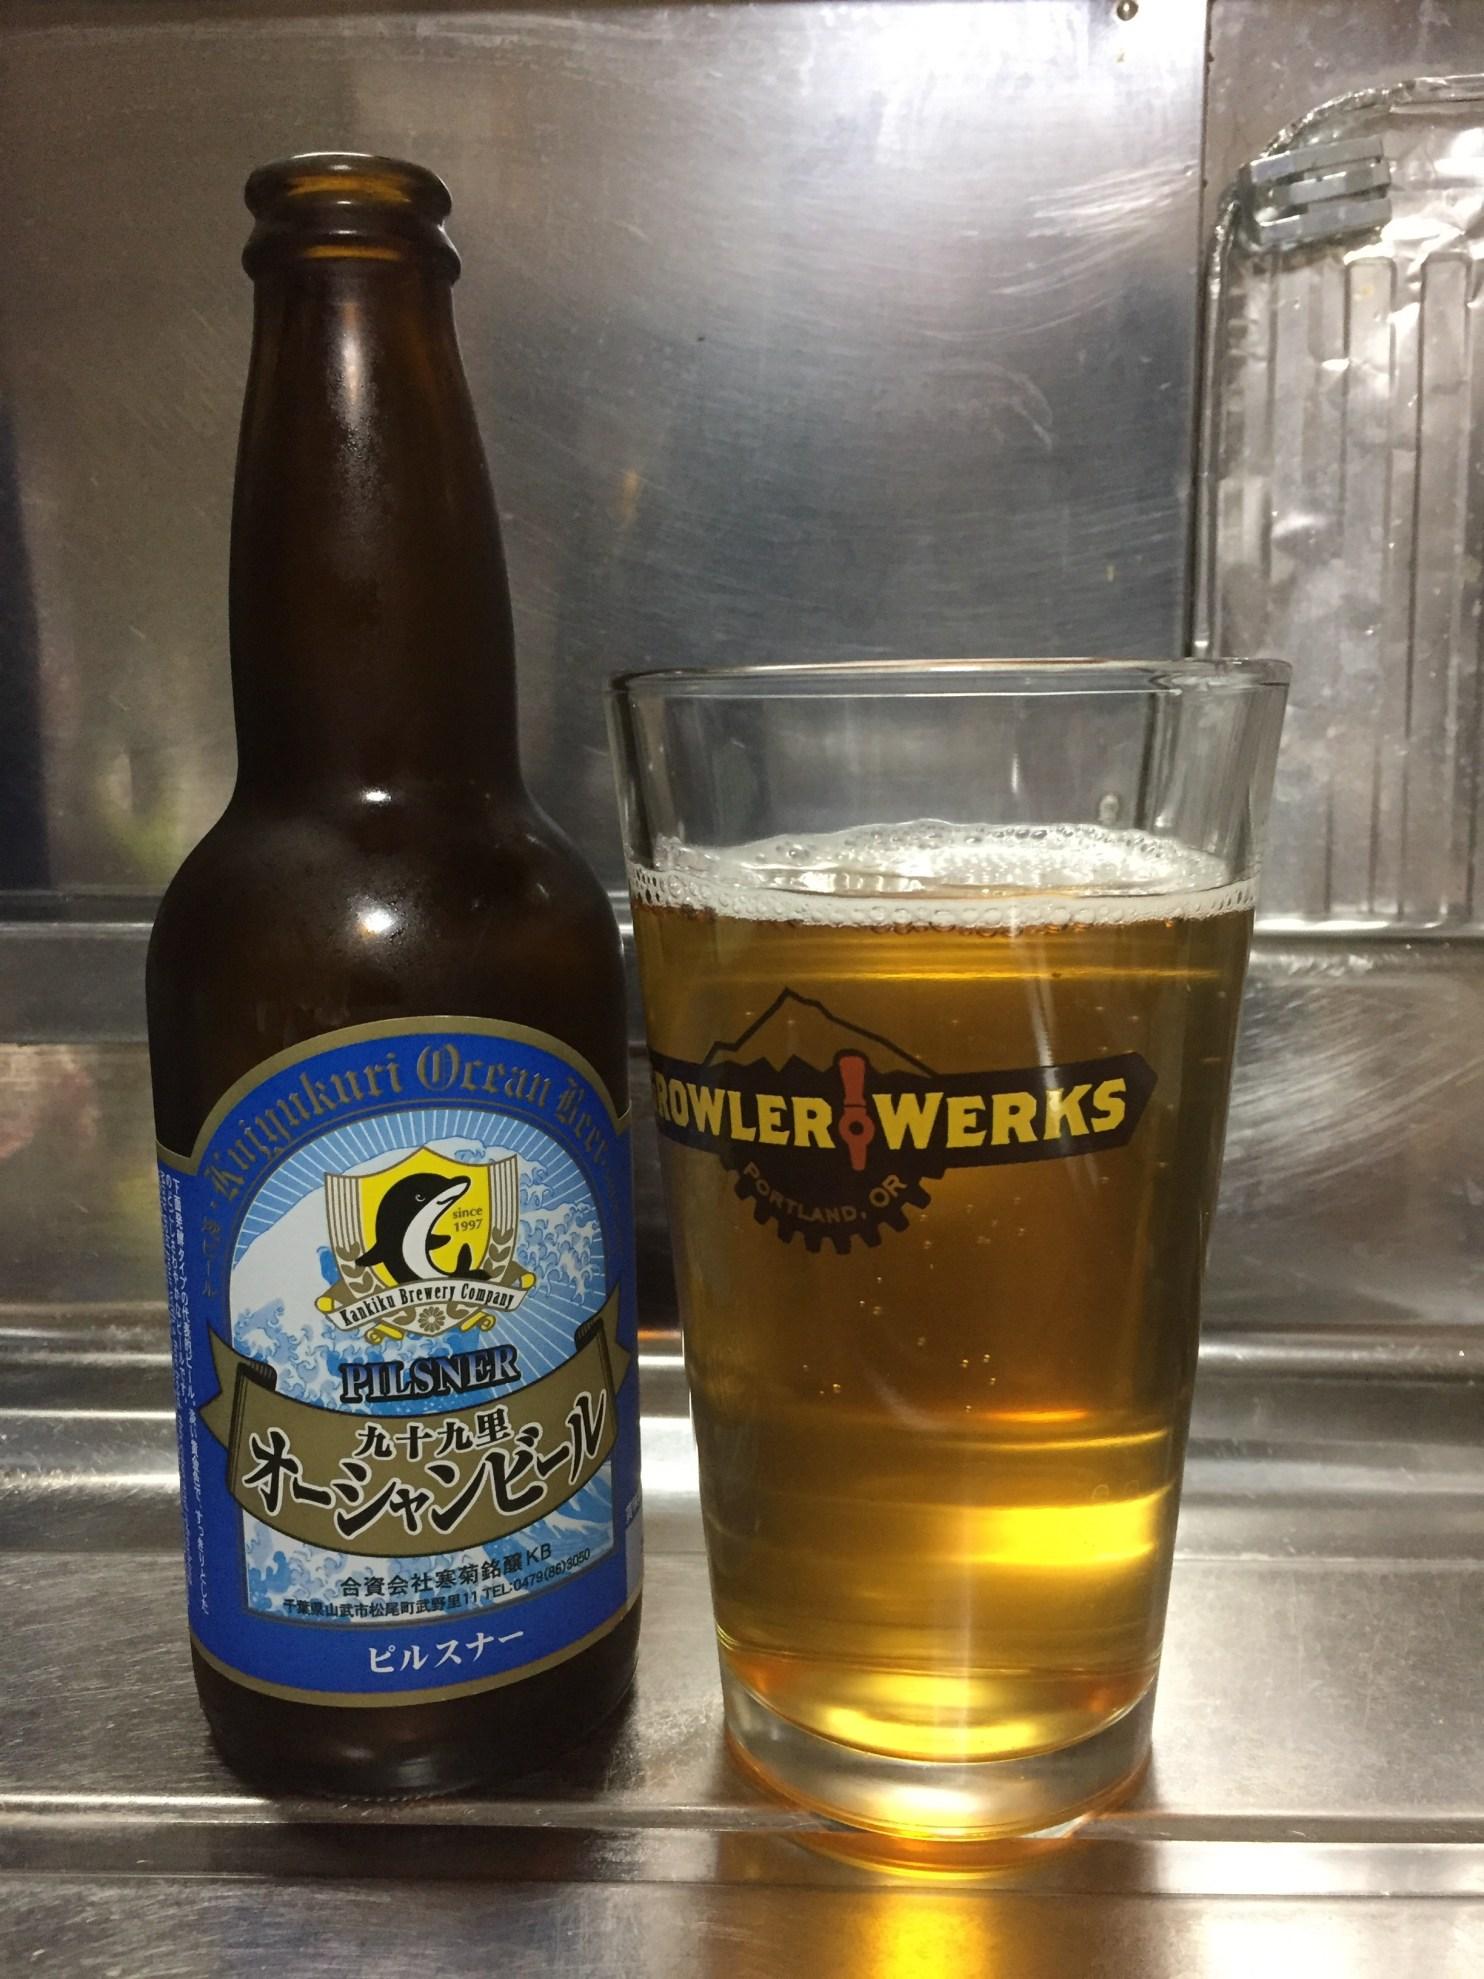 Kujukuri Ocean Beer Pilsner